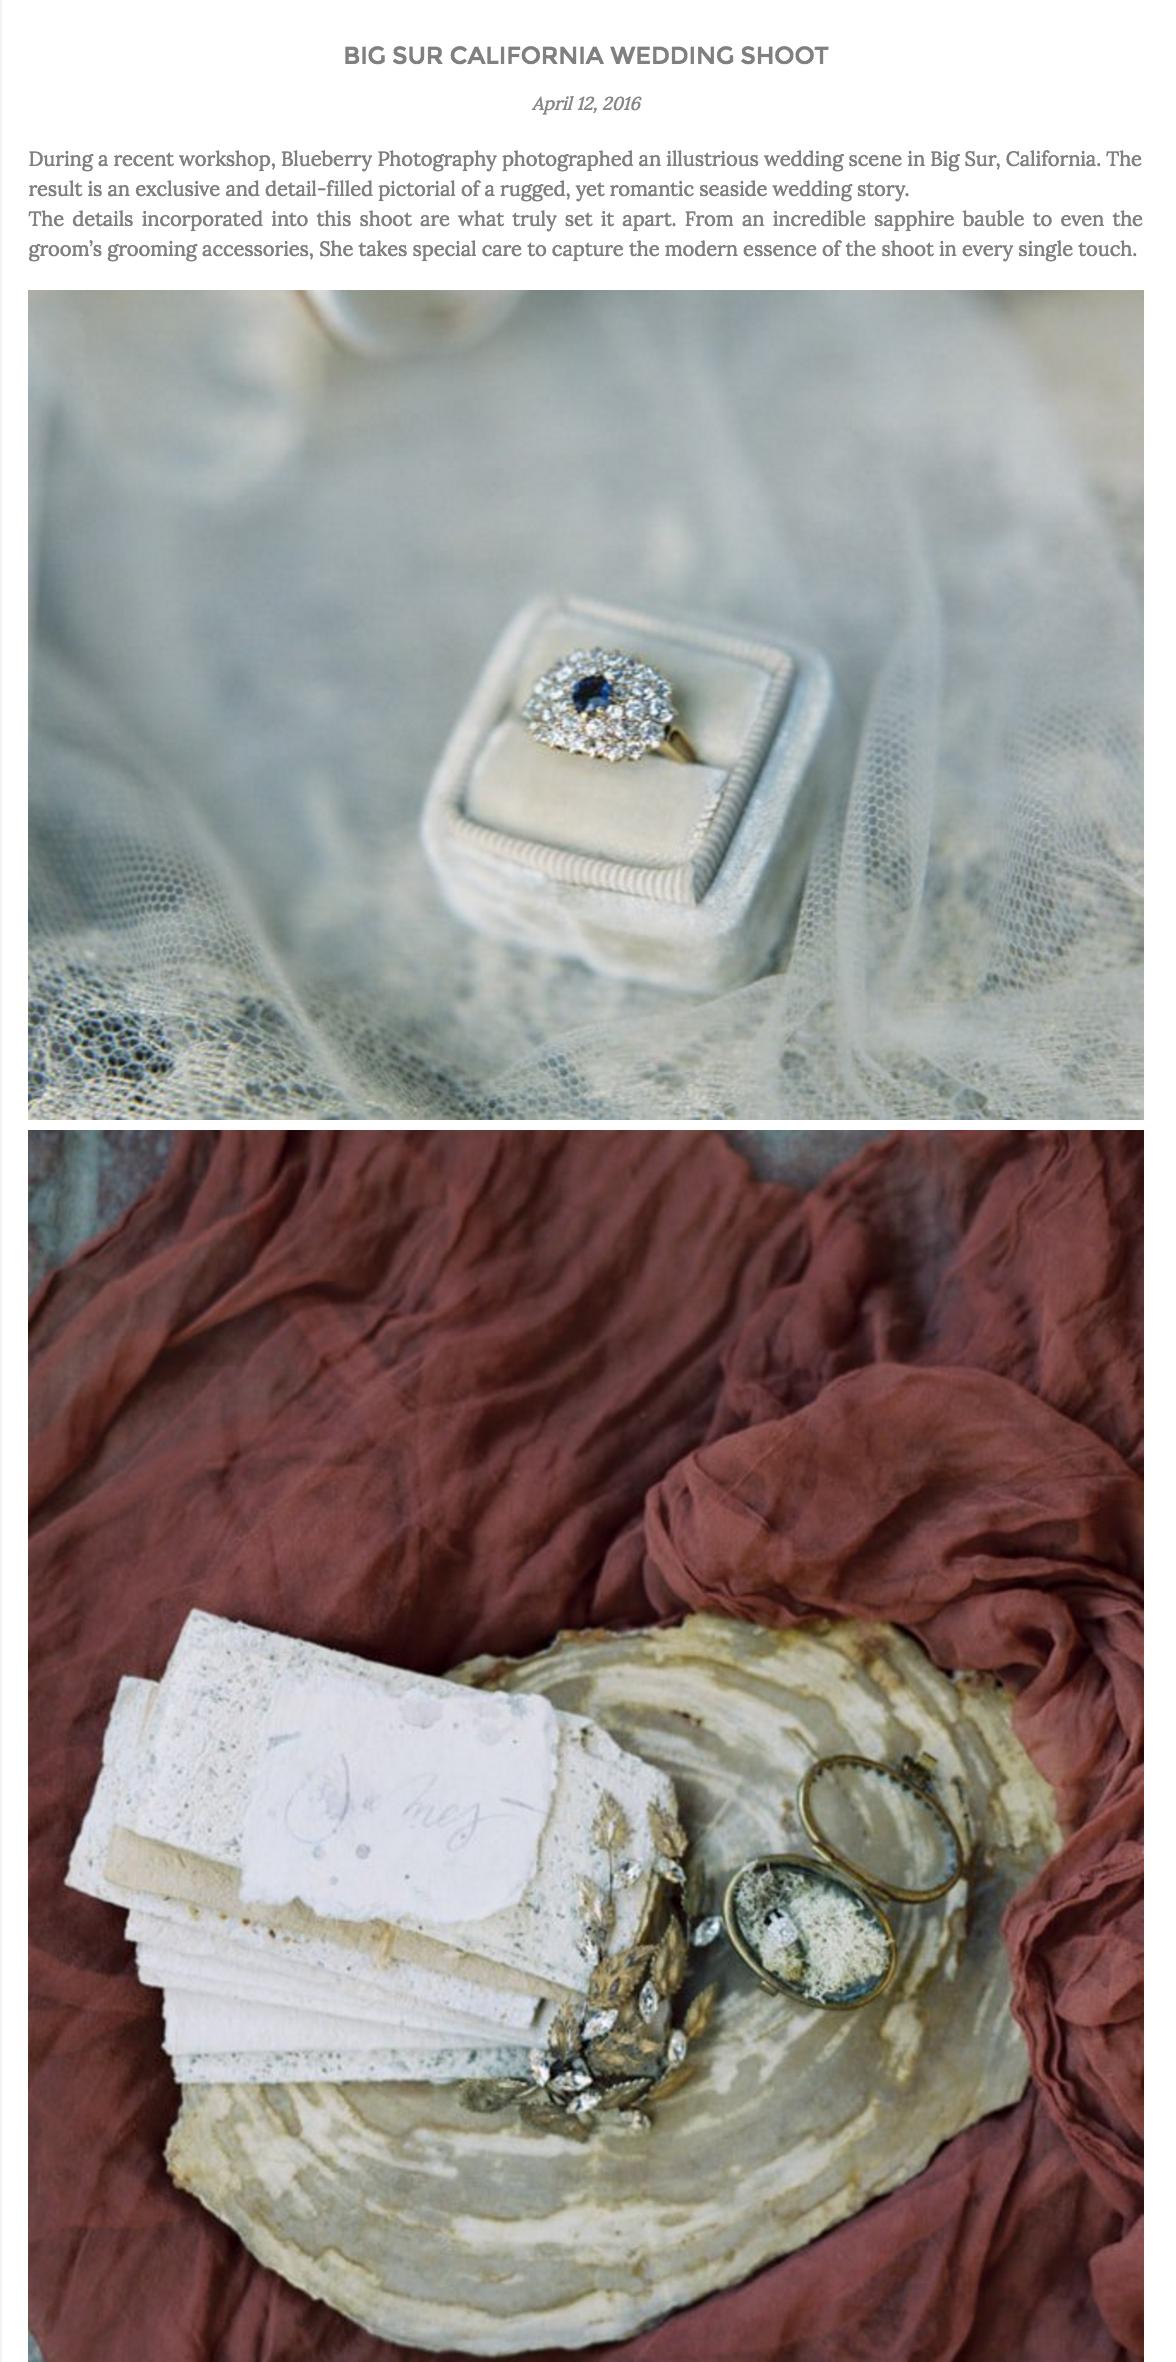 blueberryphotography.com